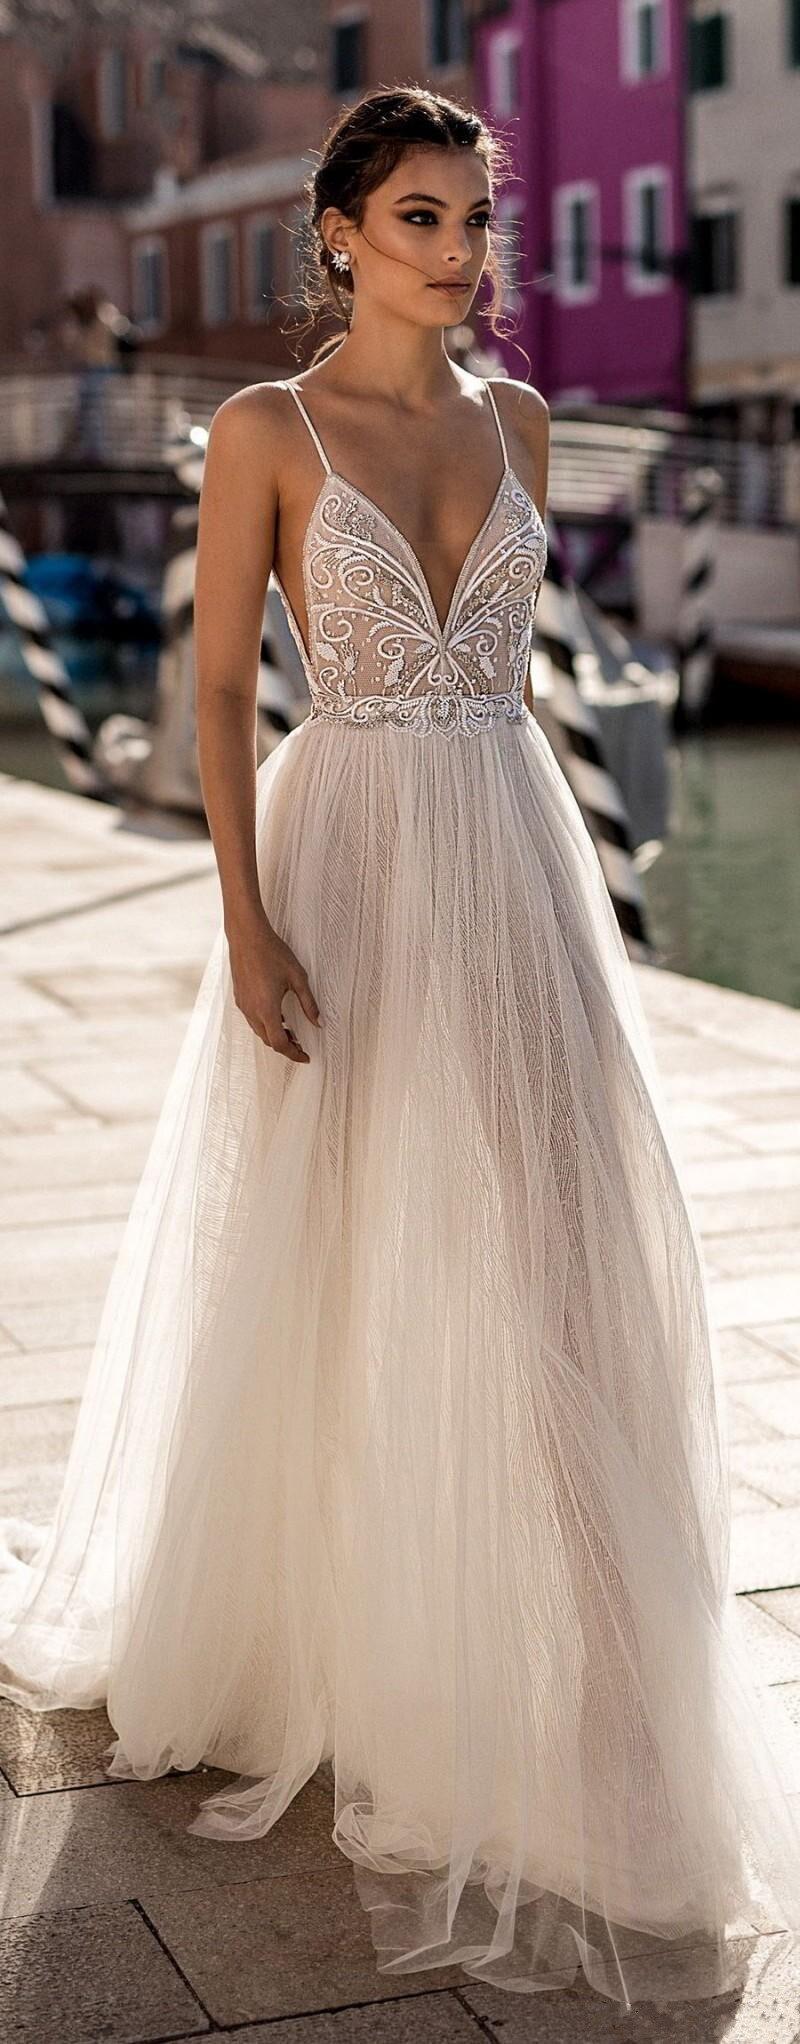 gali-karten-2019-beach-wedding-dresses-side-split-spaghetti-sexy-illusion-boho-a-line-wedding-dresses-pearls-backless-bohemian-bridal-gowns (1)